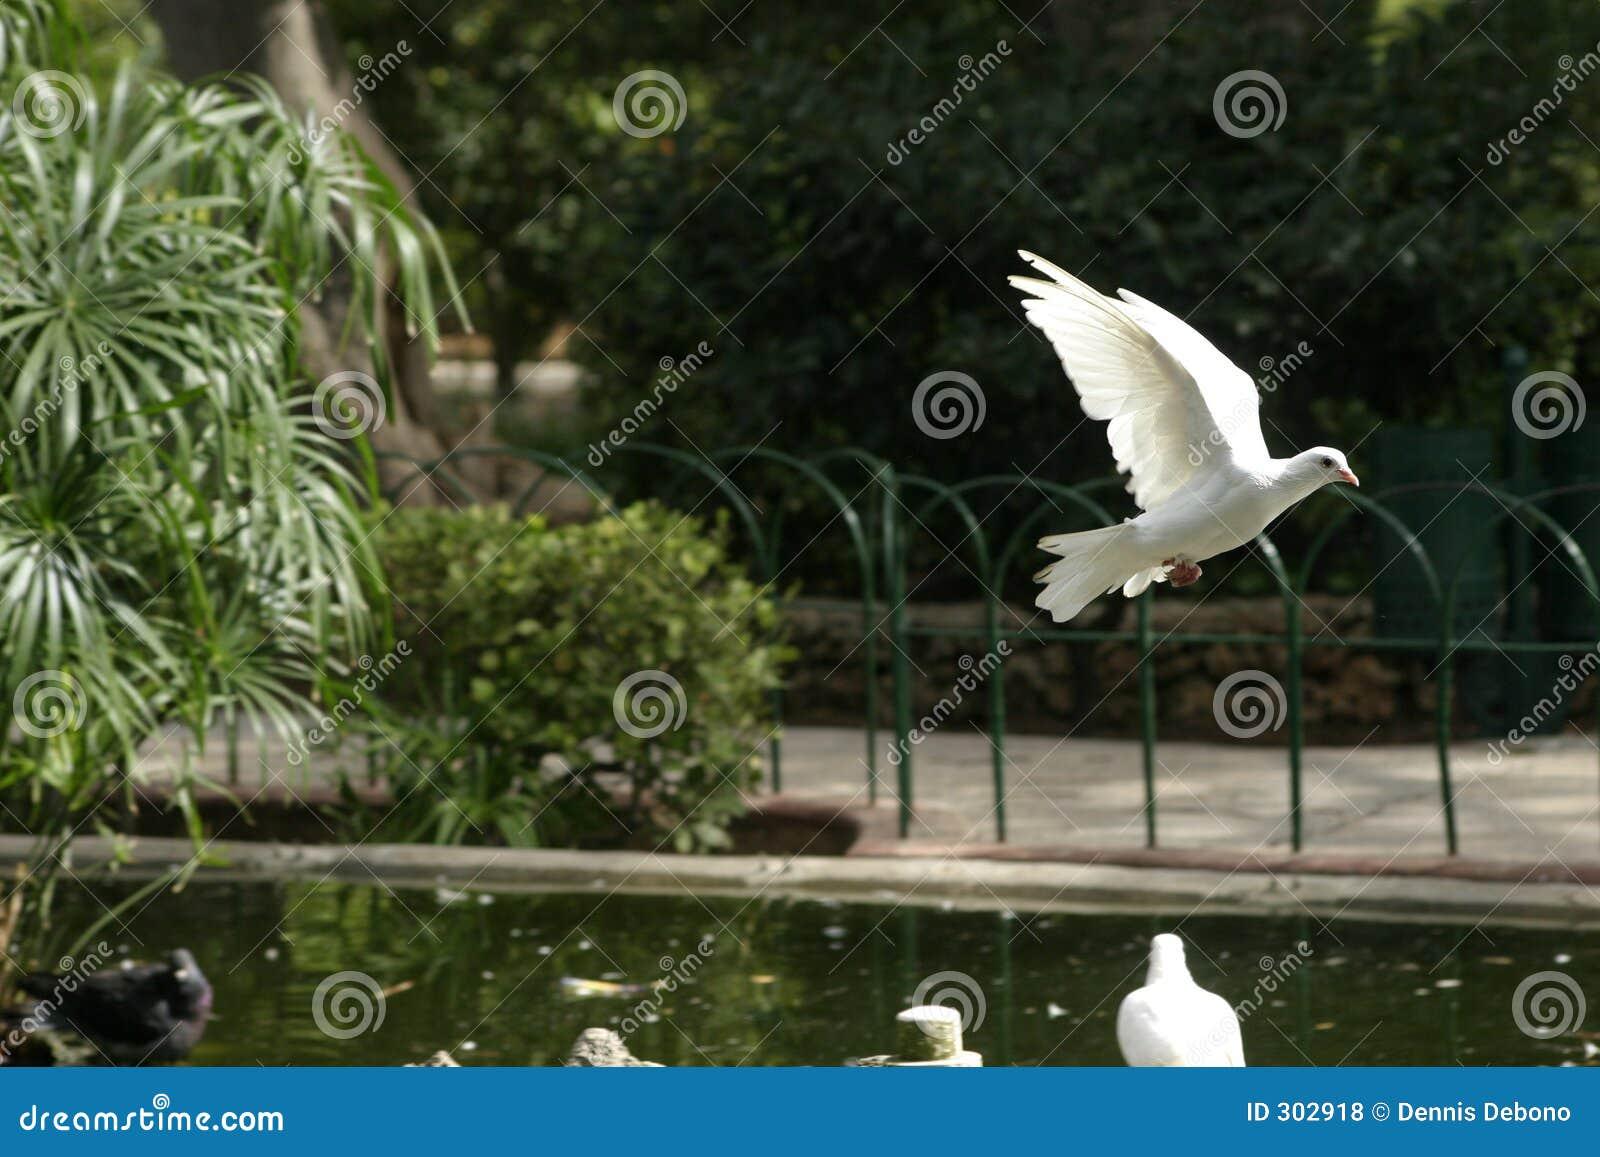 Competindo o pombo